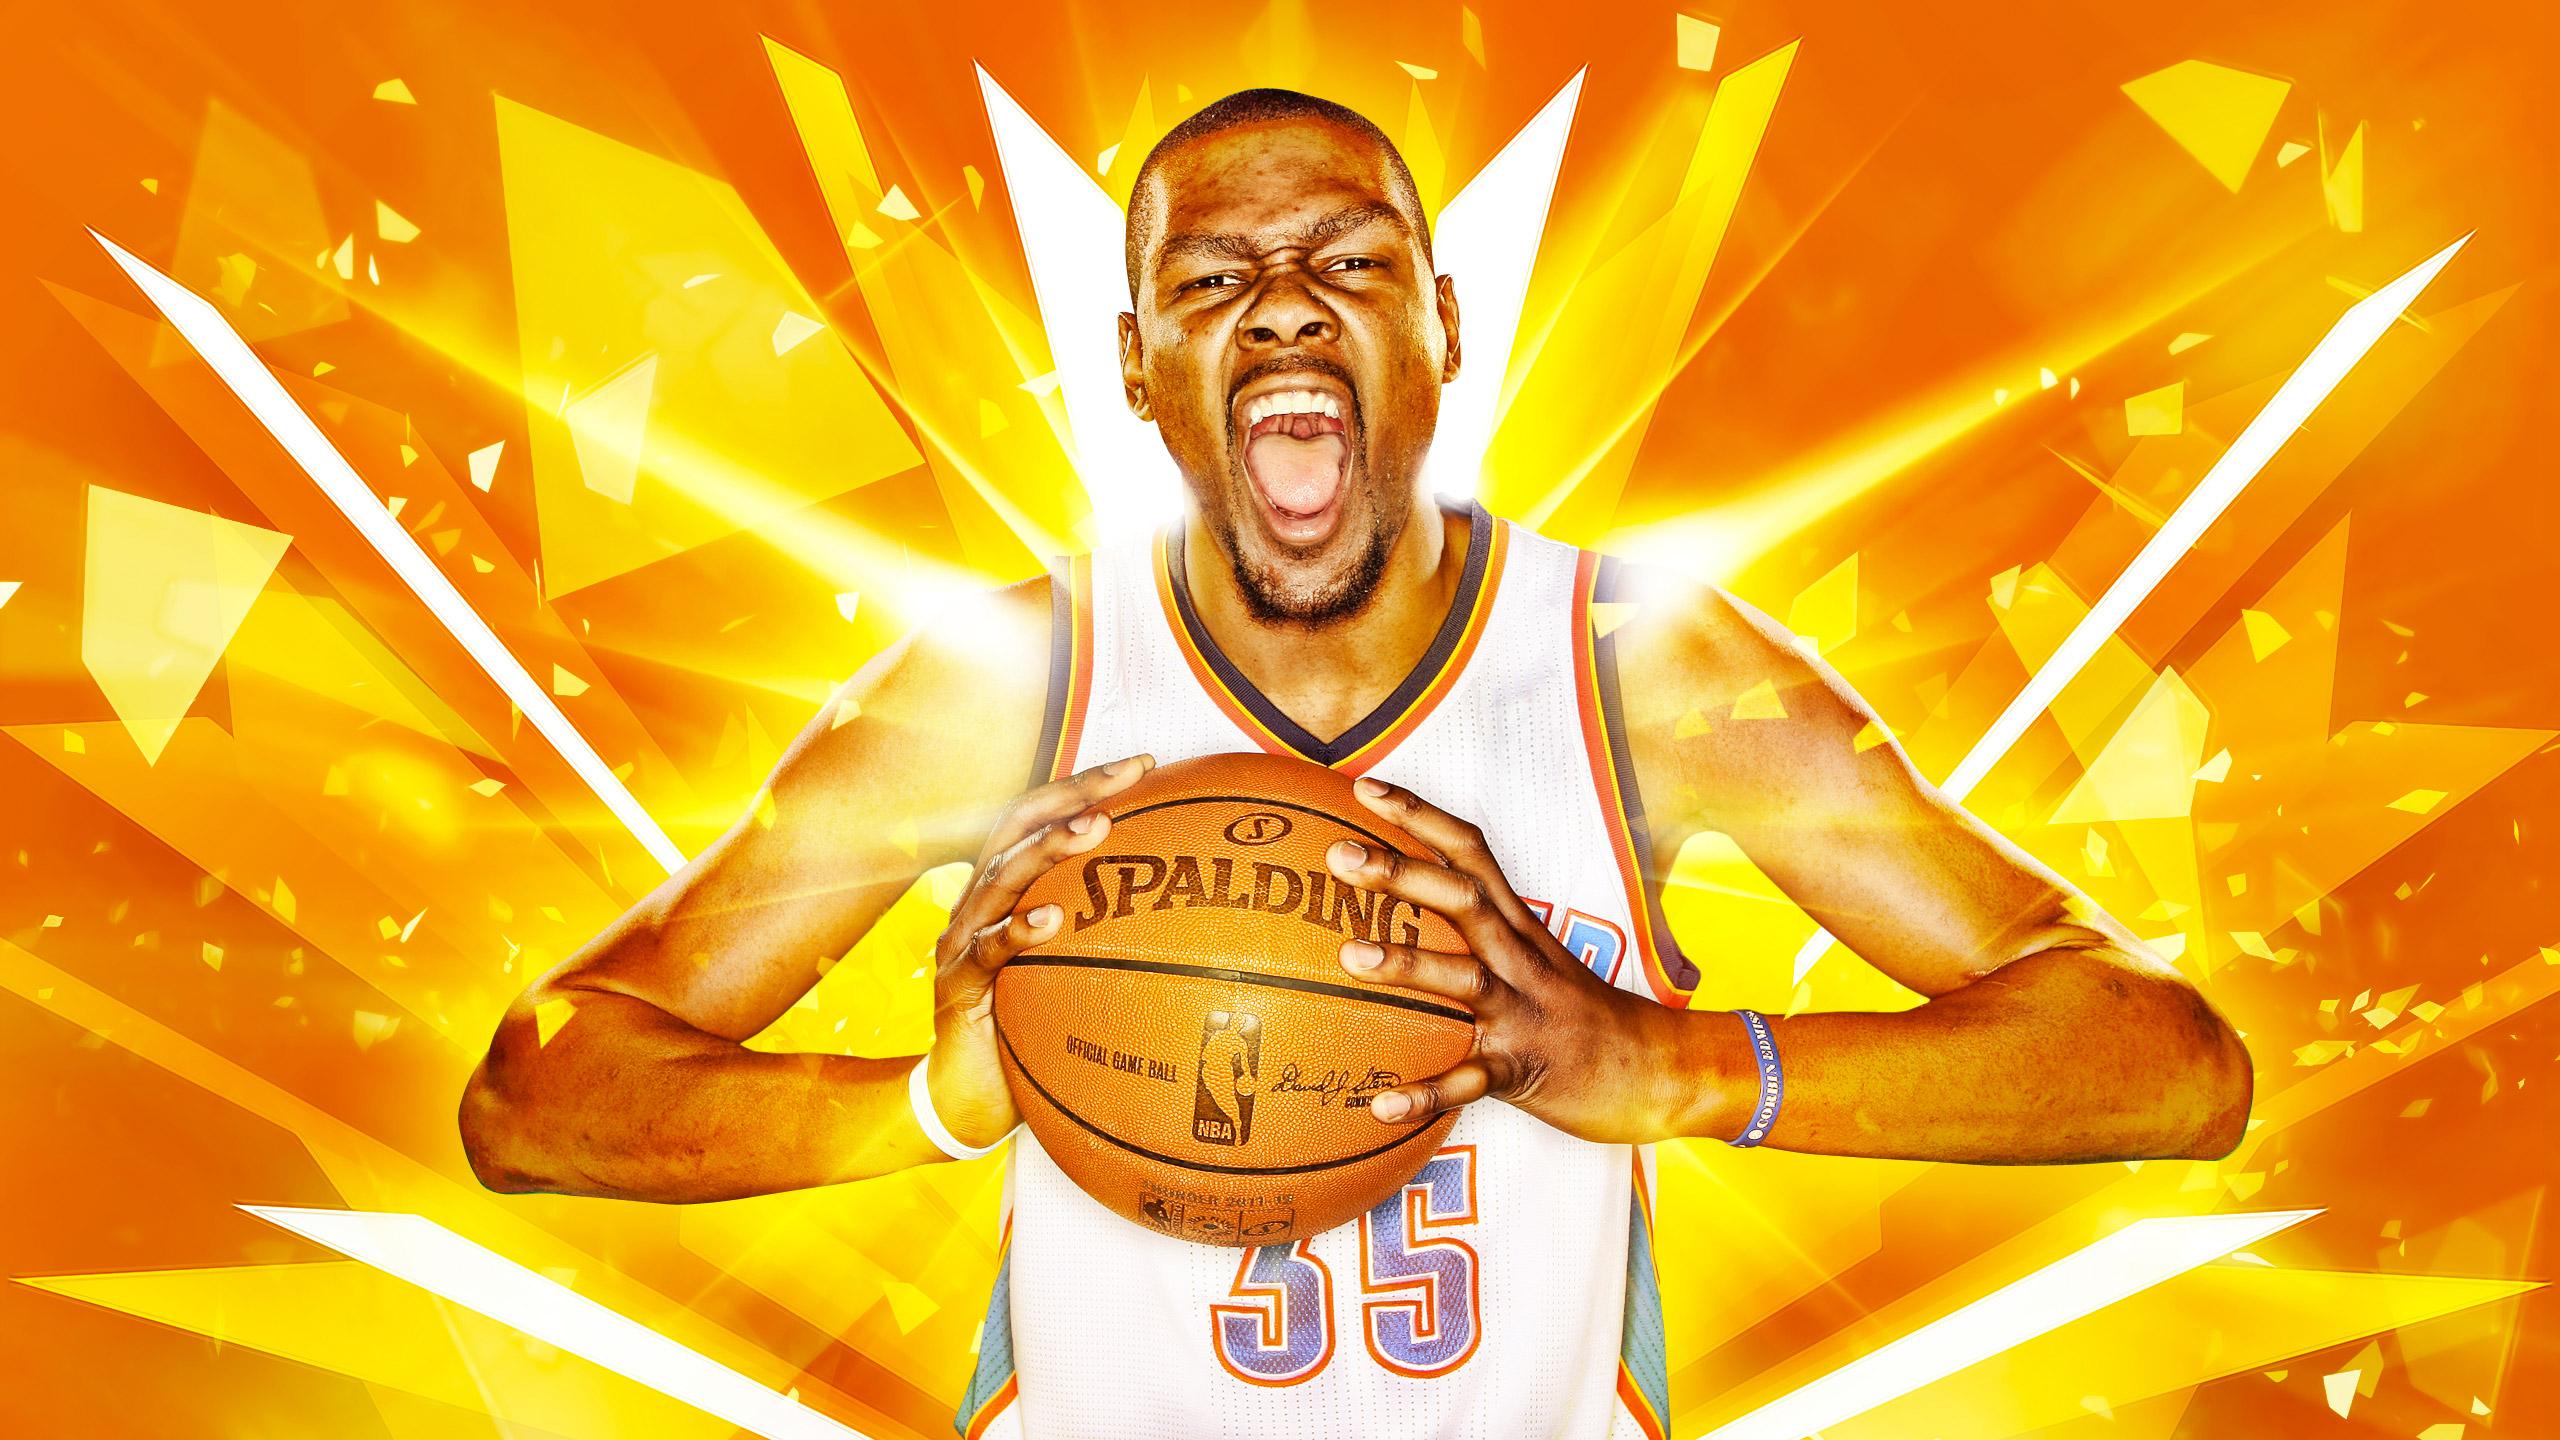 Kevin Durant OKC Thunder 2016 Wallpaper Basketball 2560x1440